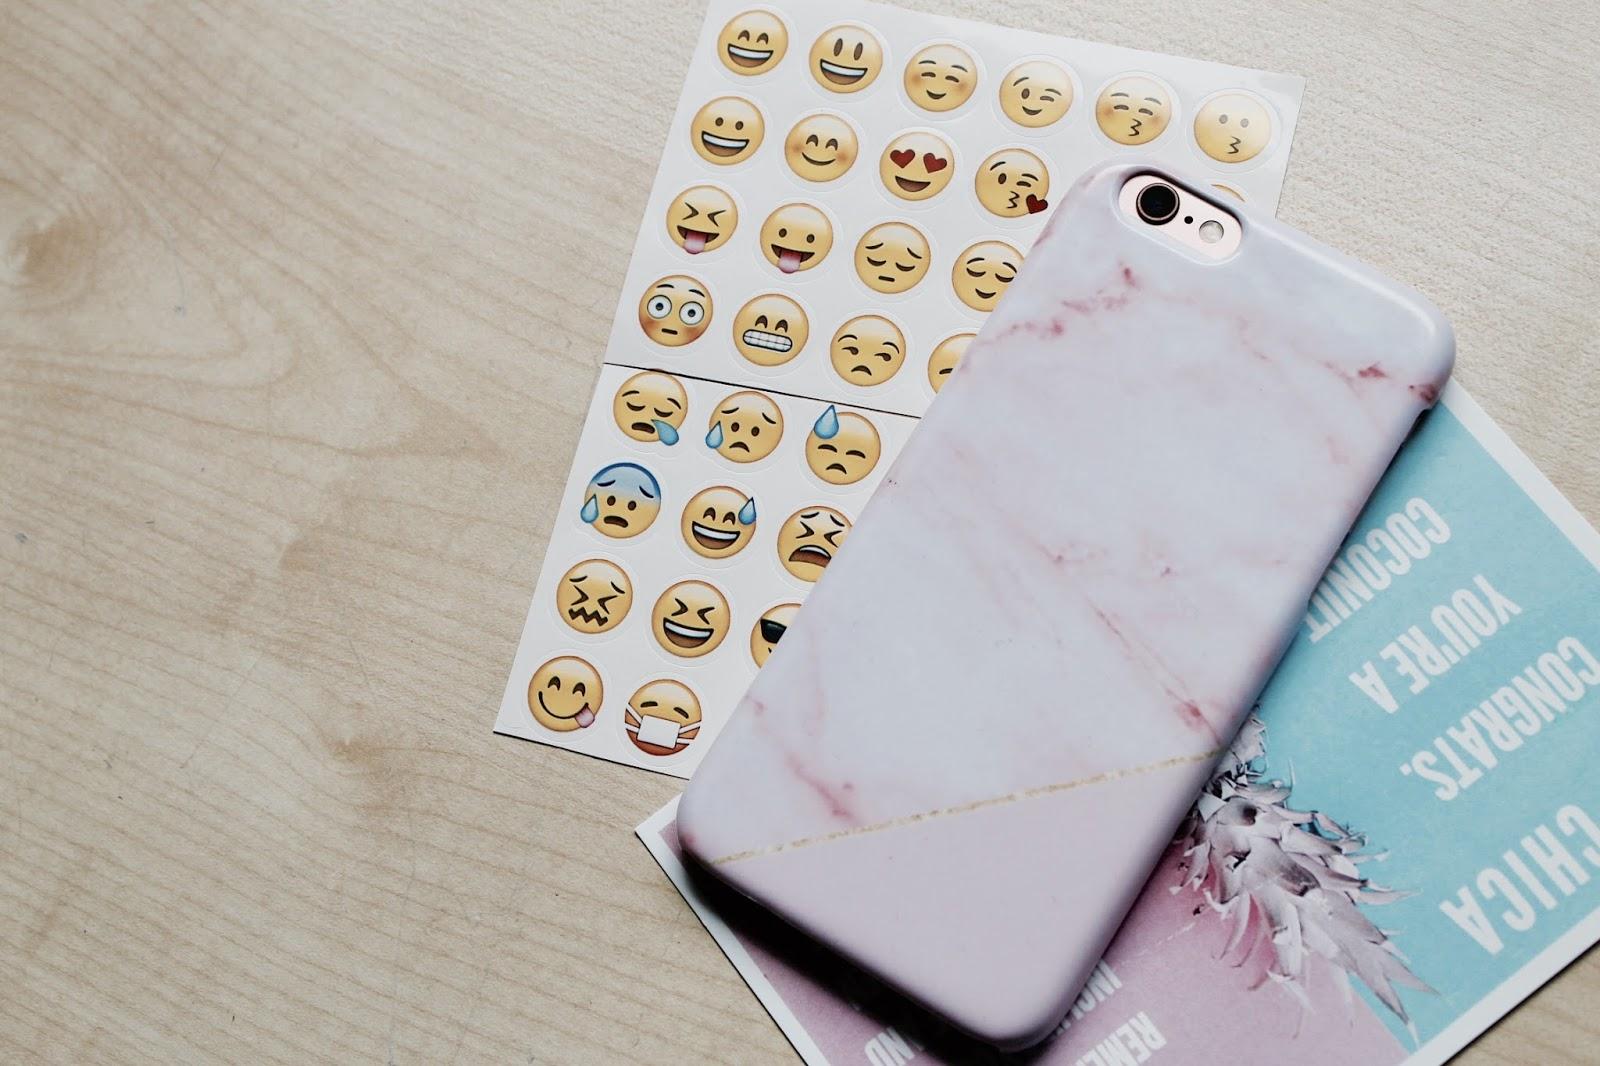 Coconut Lane Phone Case & Emoji Stickers